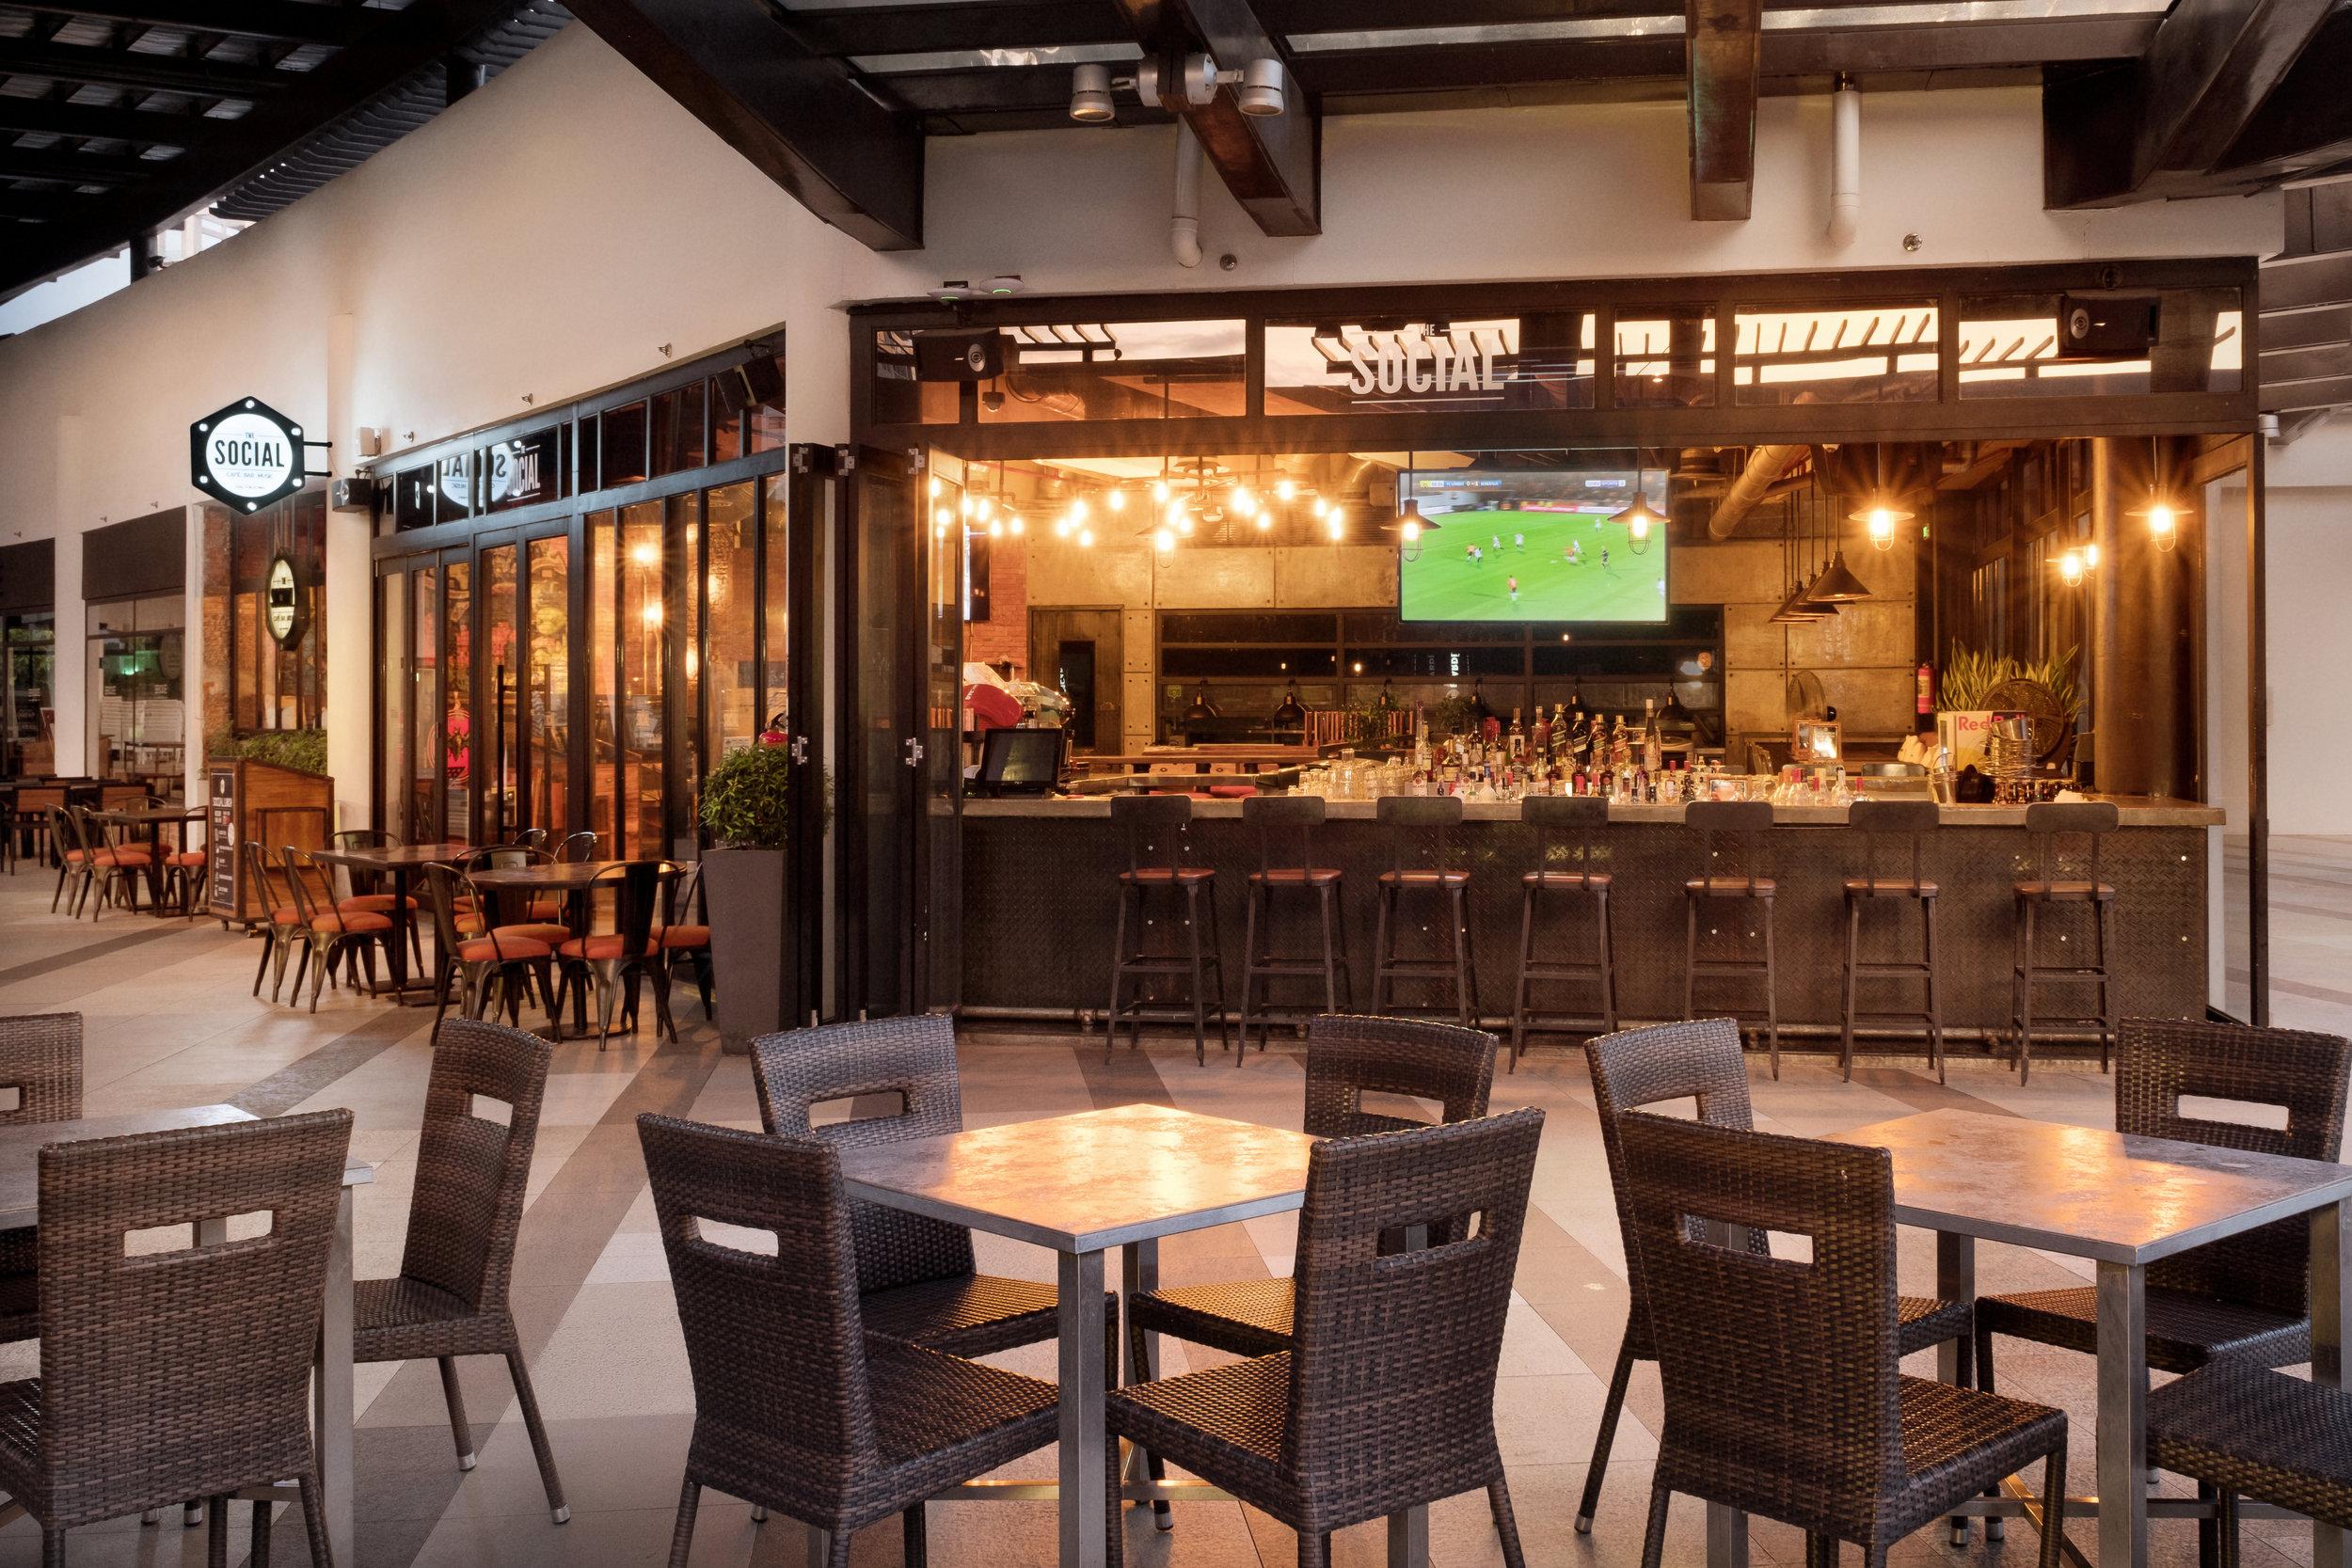 The Social Cebu   Tadcaster Hospitality